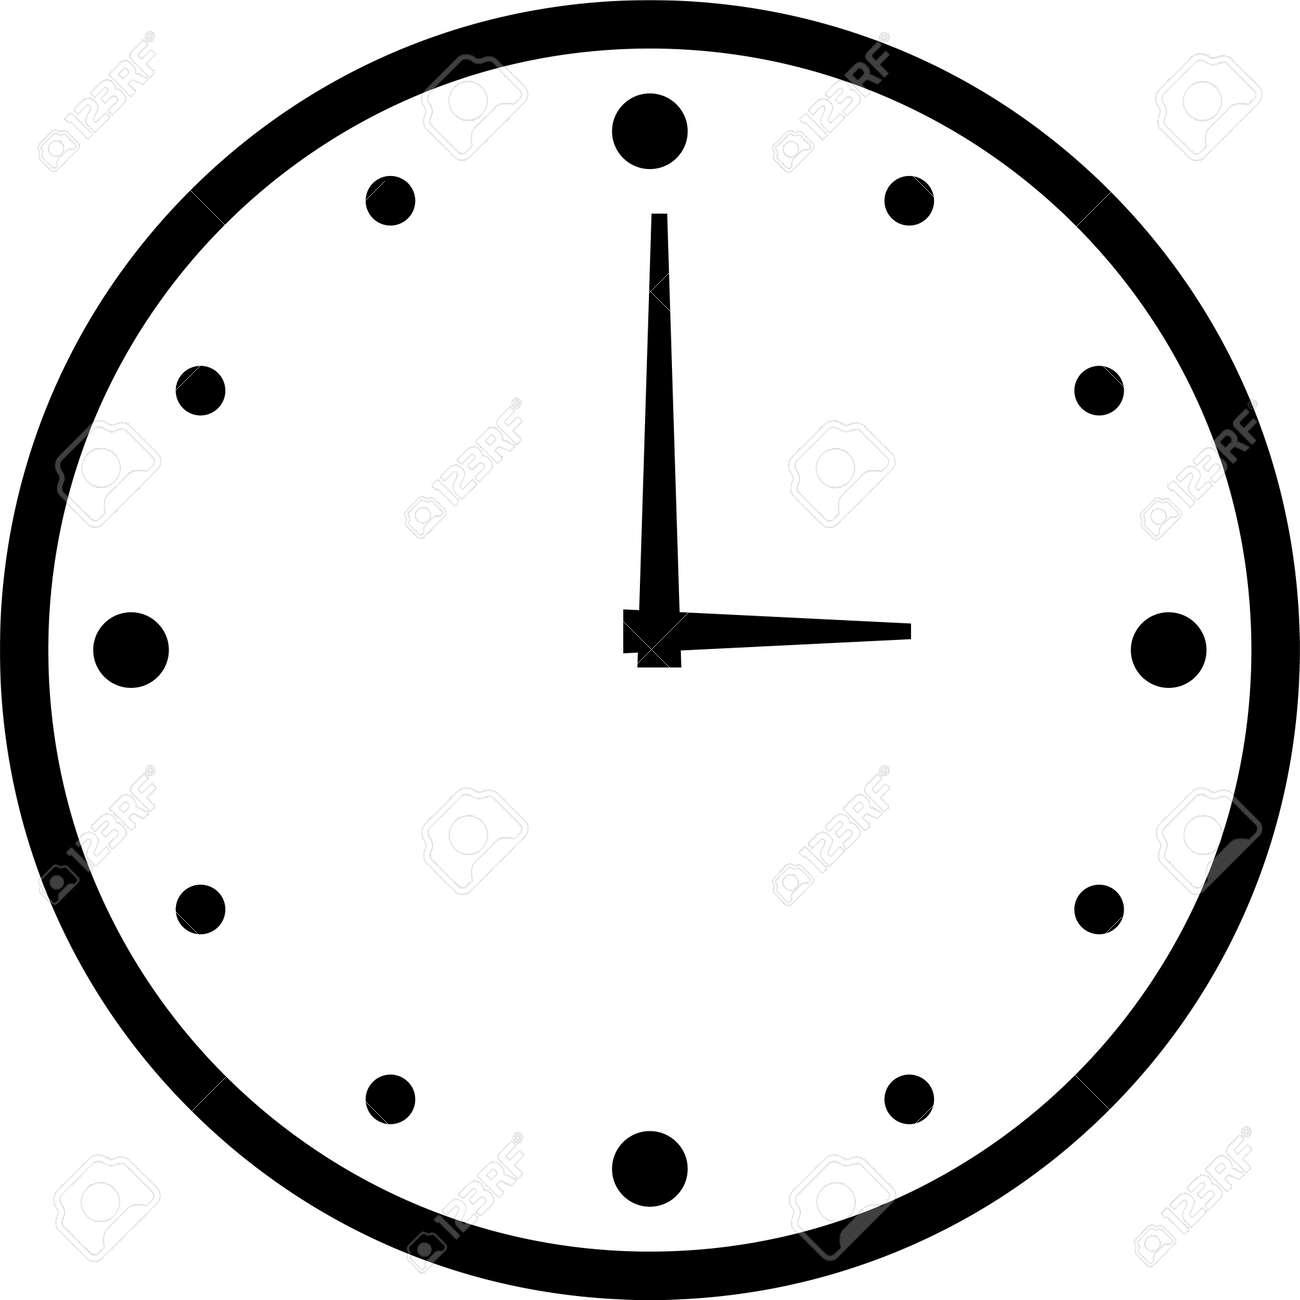 Clock Time Icon Vector Illustration - Vector - 154814360